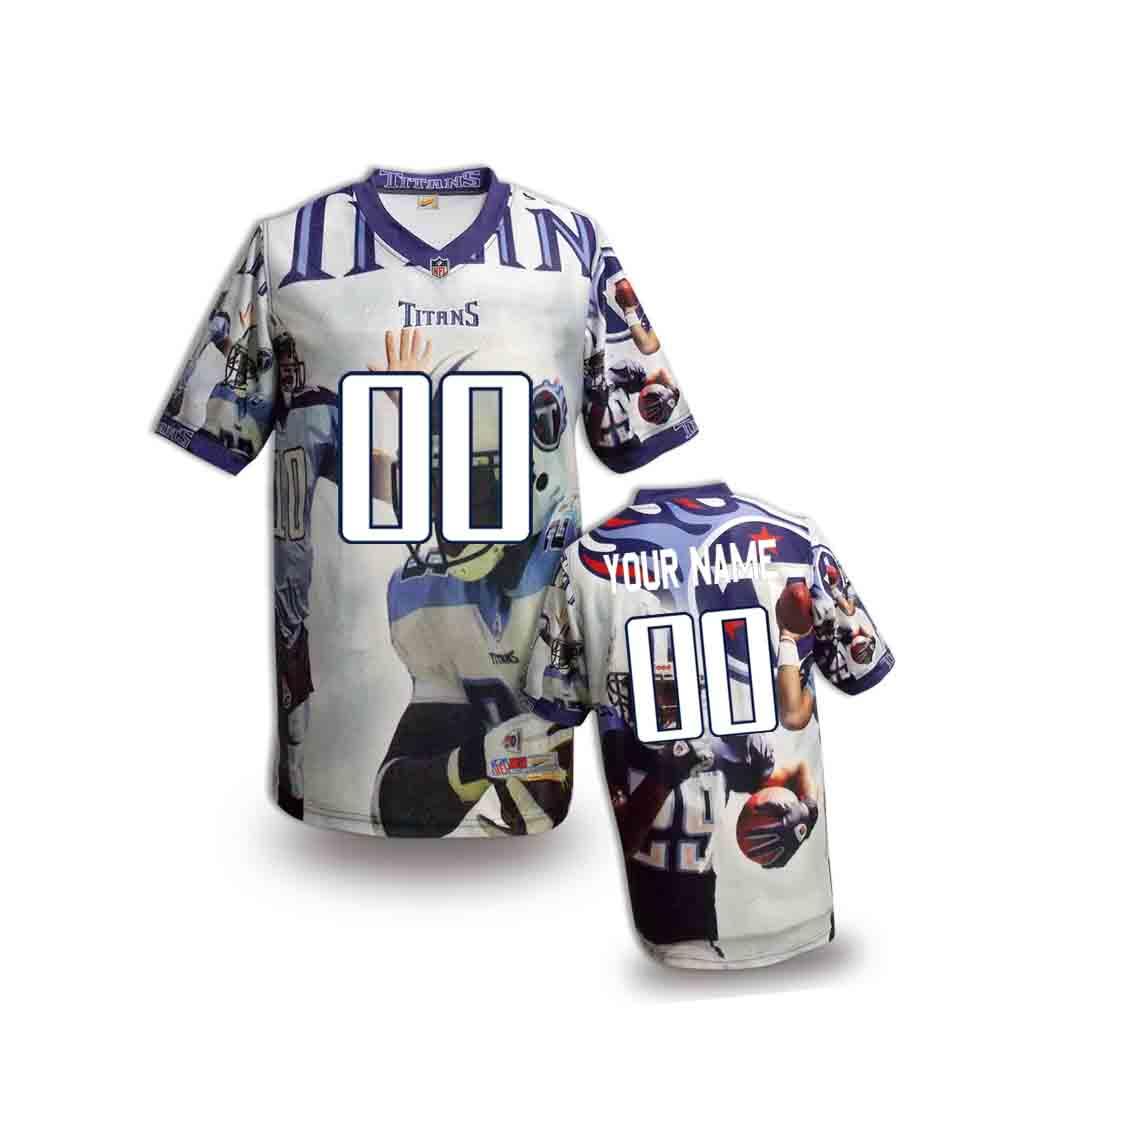 Nike Titans Customized Fashion Stitched Youth Jerseys04